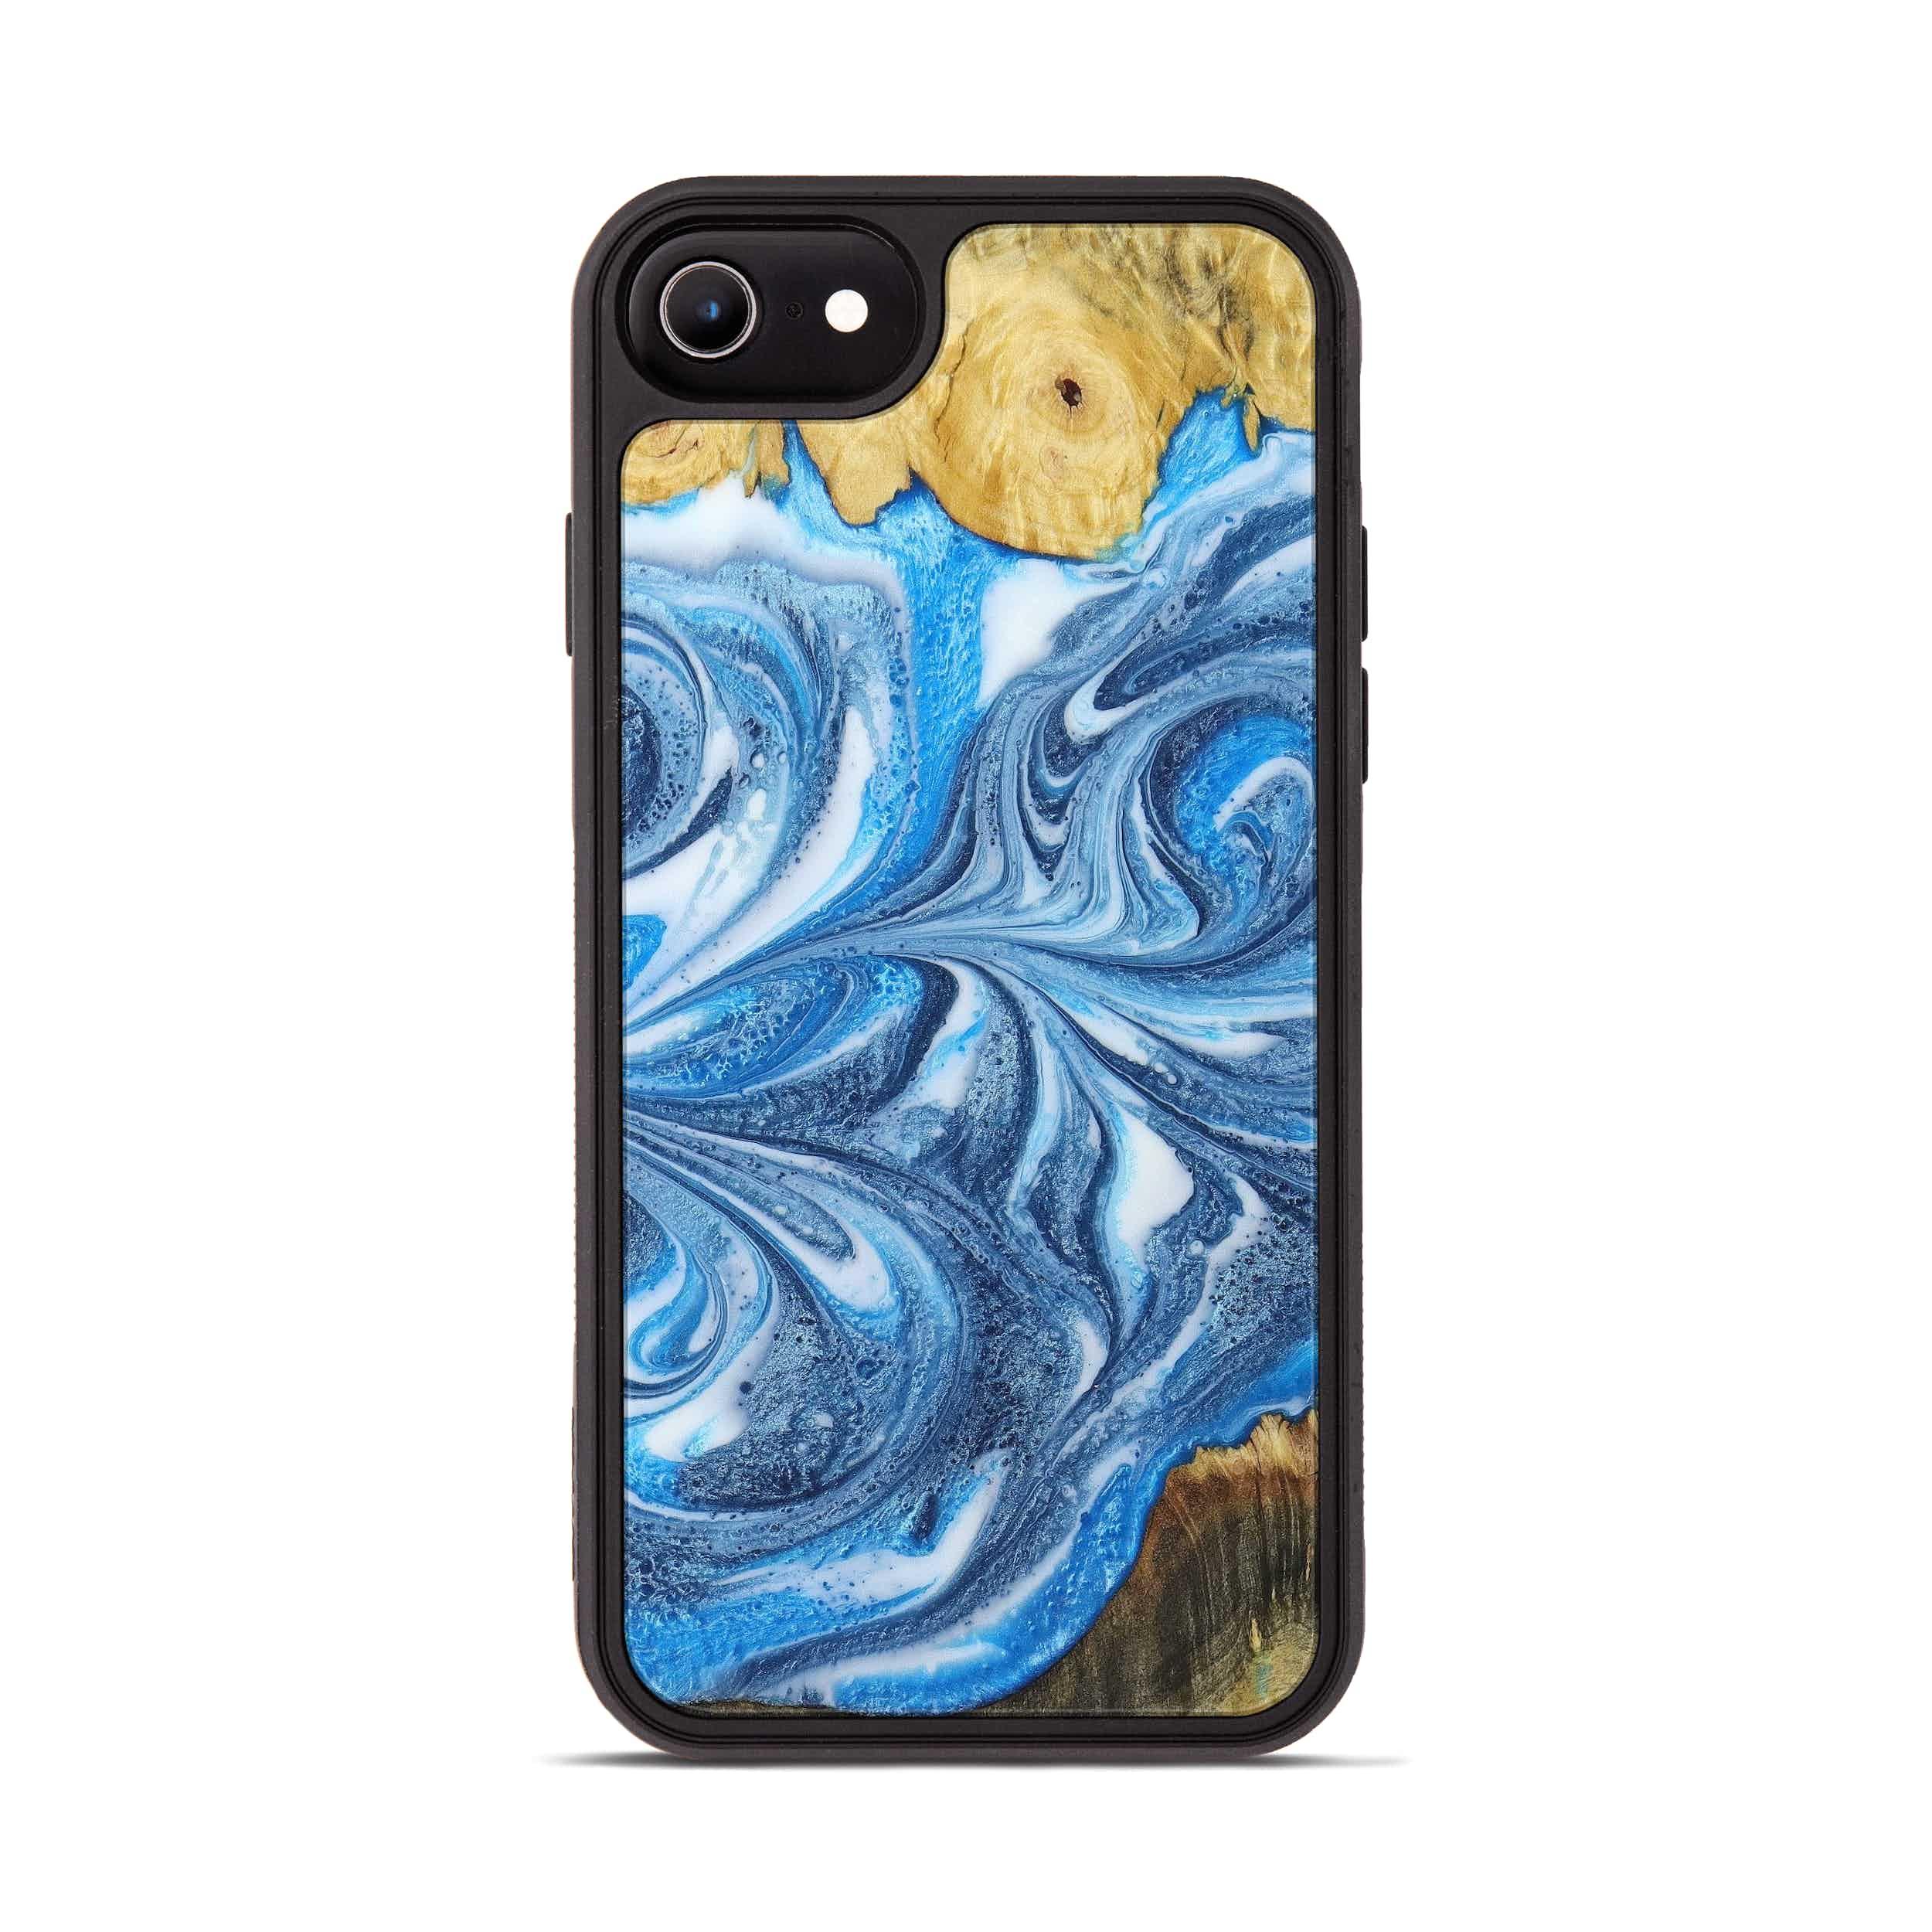 iPhone 6s Wood+Resin Phone Case - Avinash (Light Blue, 396120)